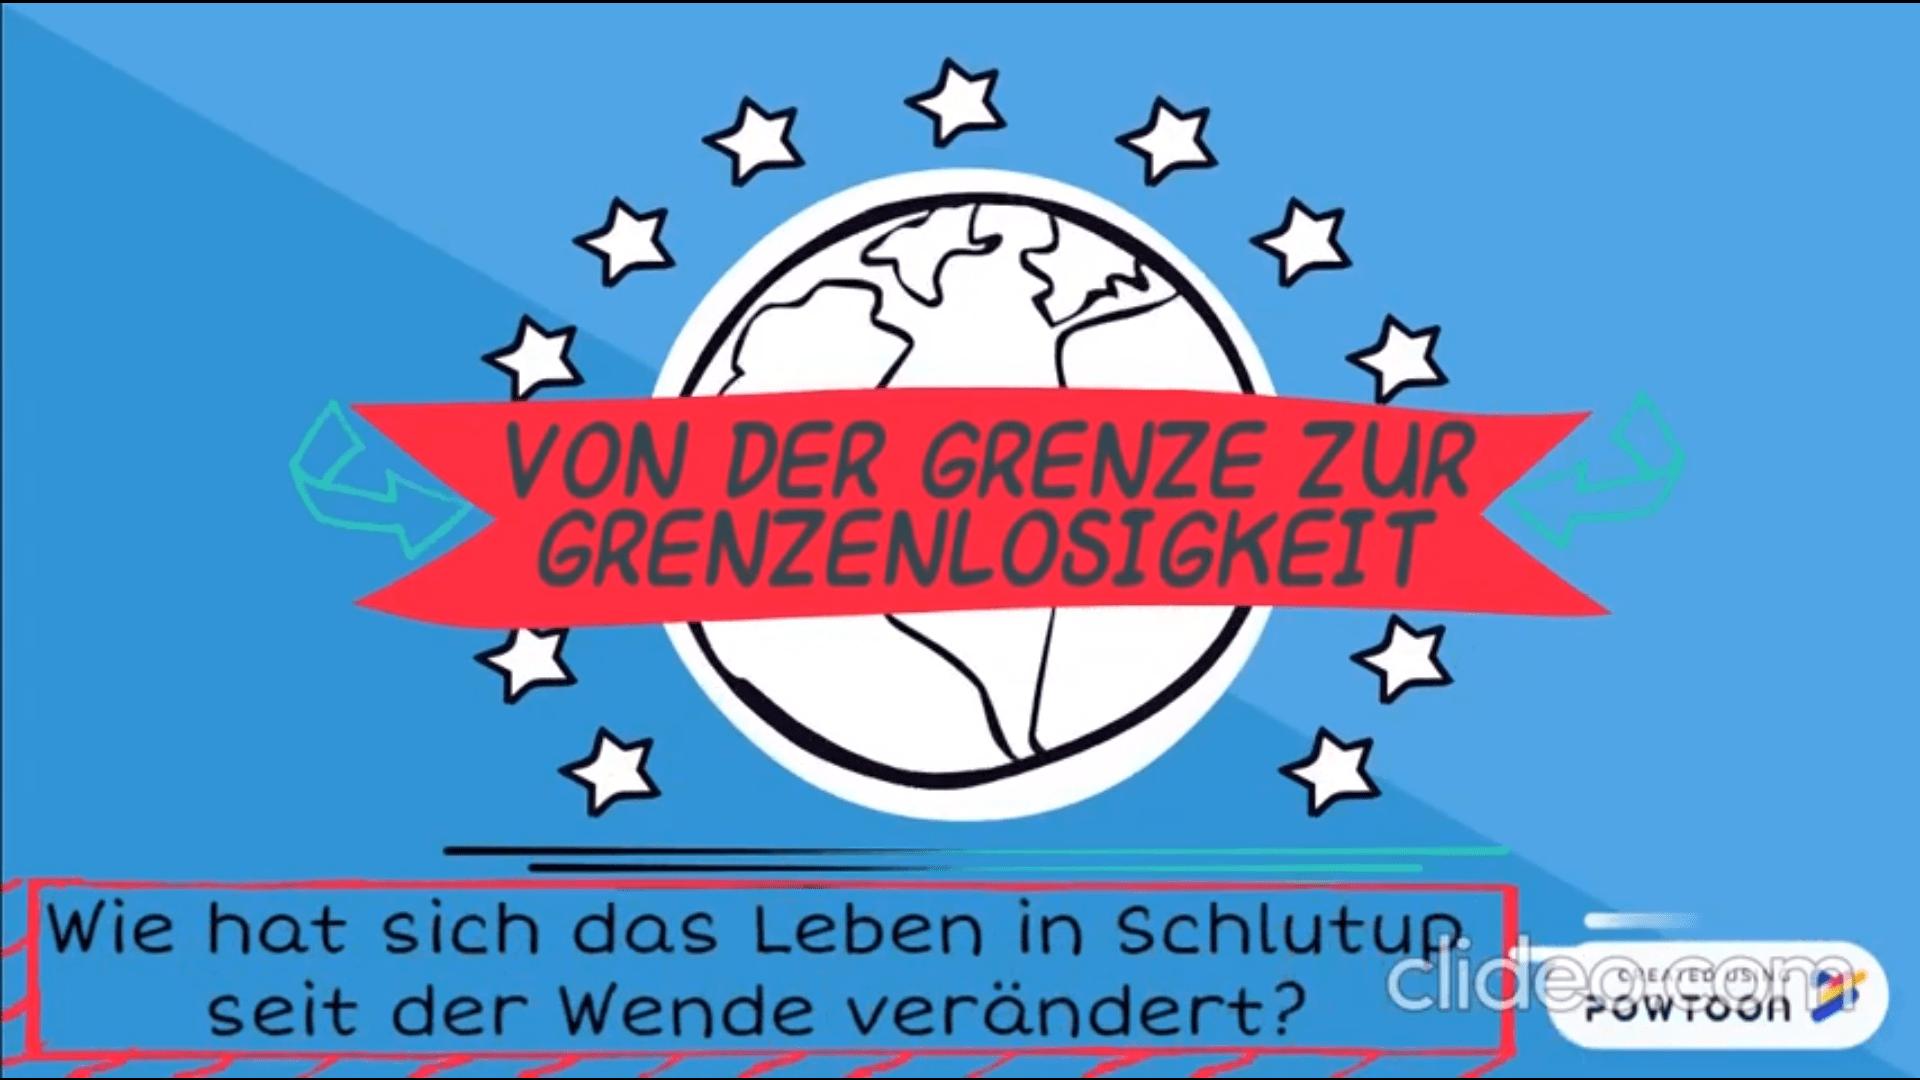 Grenzübergang Lübeck-Schlutup